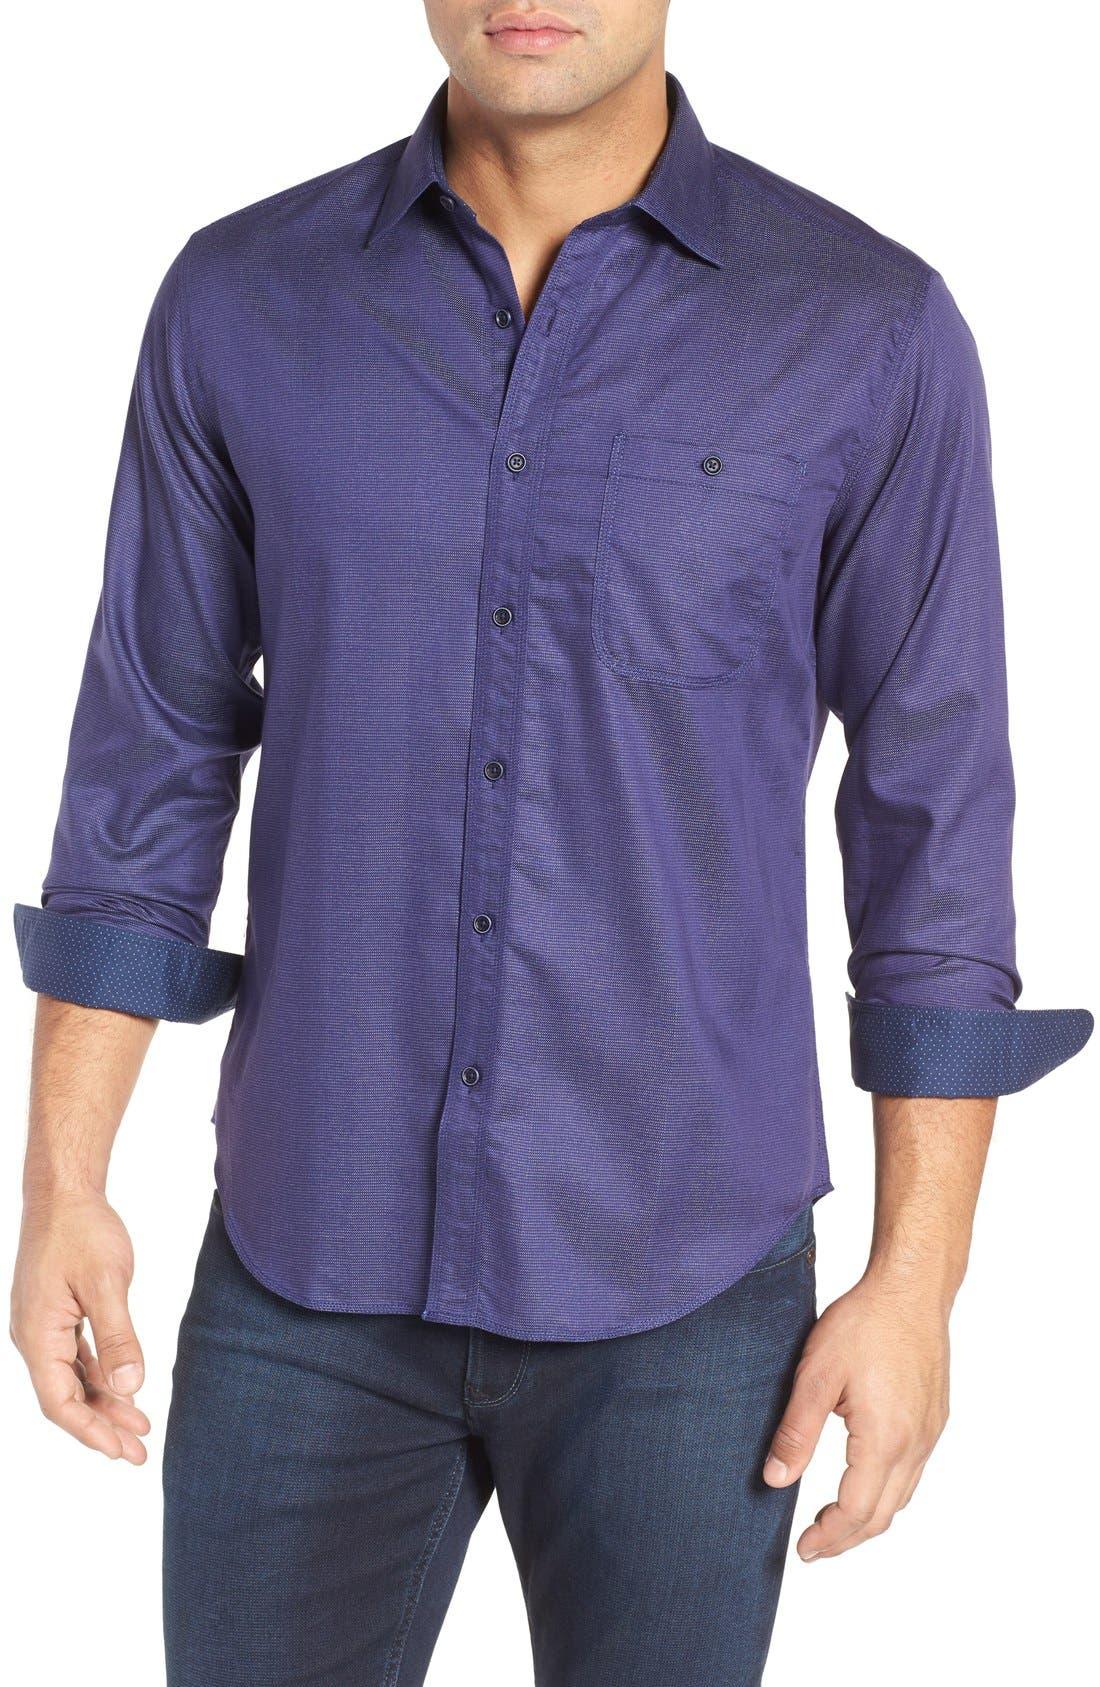 Alternate Image 1 Selected - Bugatchi Shaped Fit Stripe Jacquard Sport Shirt